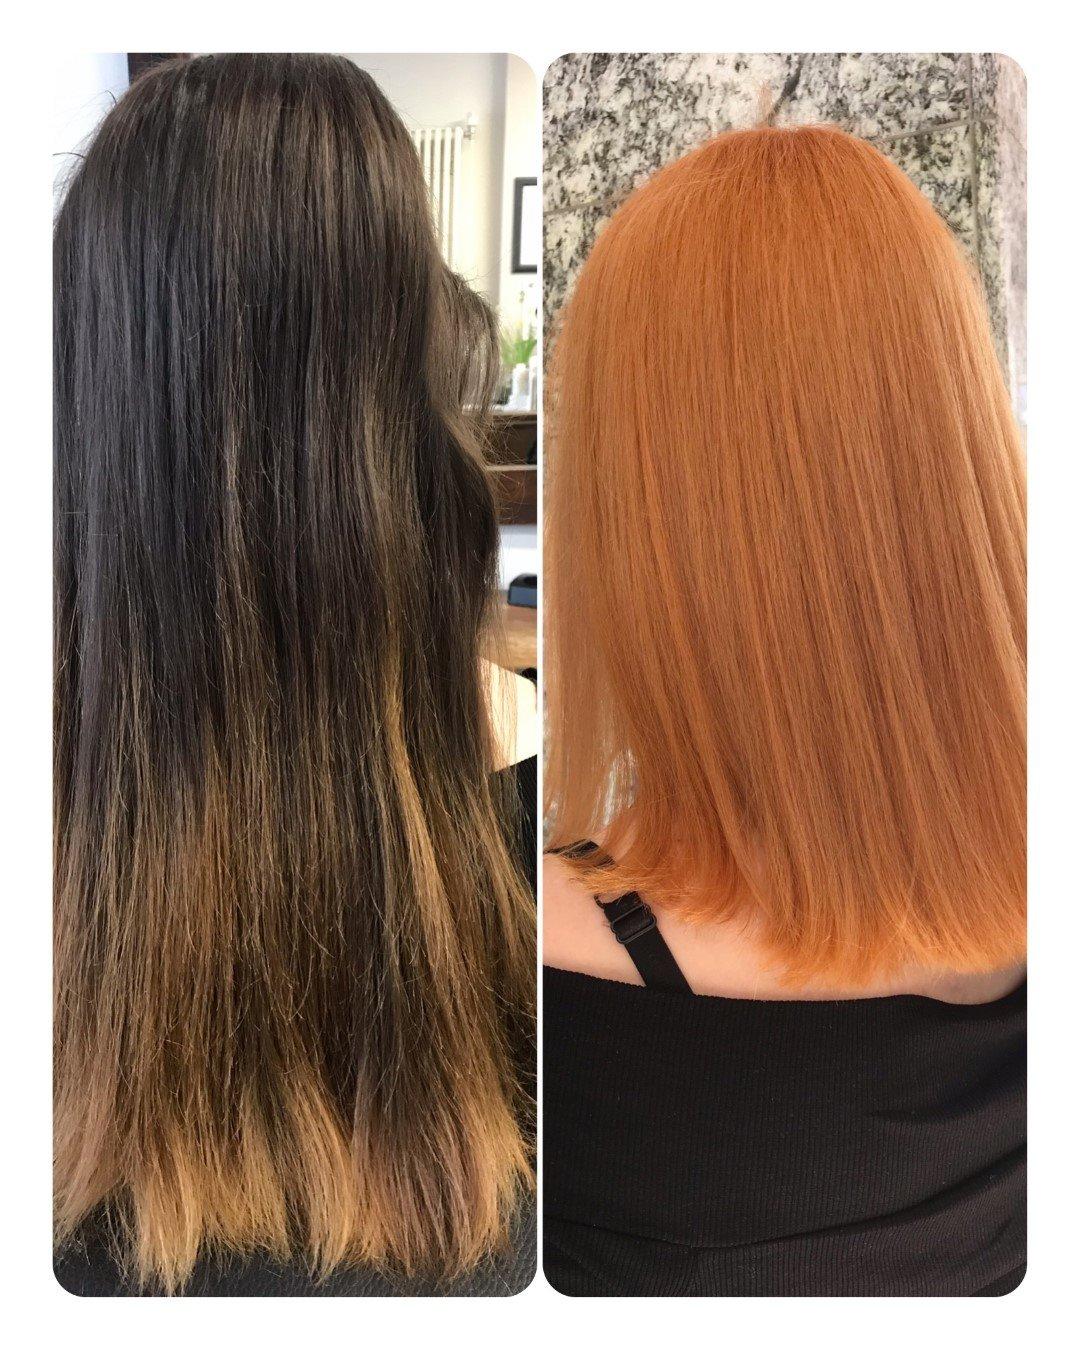 Haarschnitt Friseur Hamburg